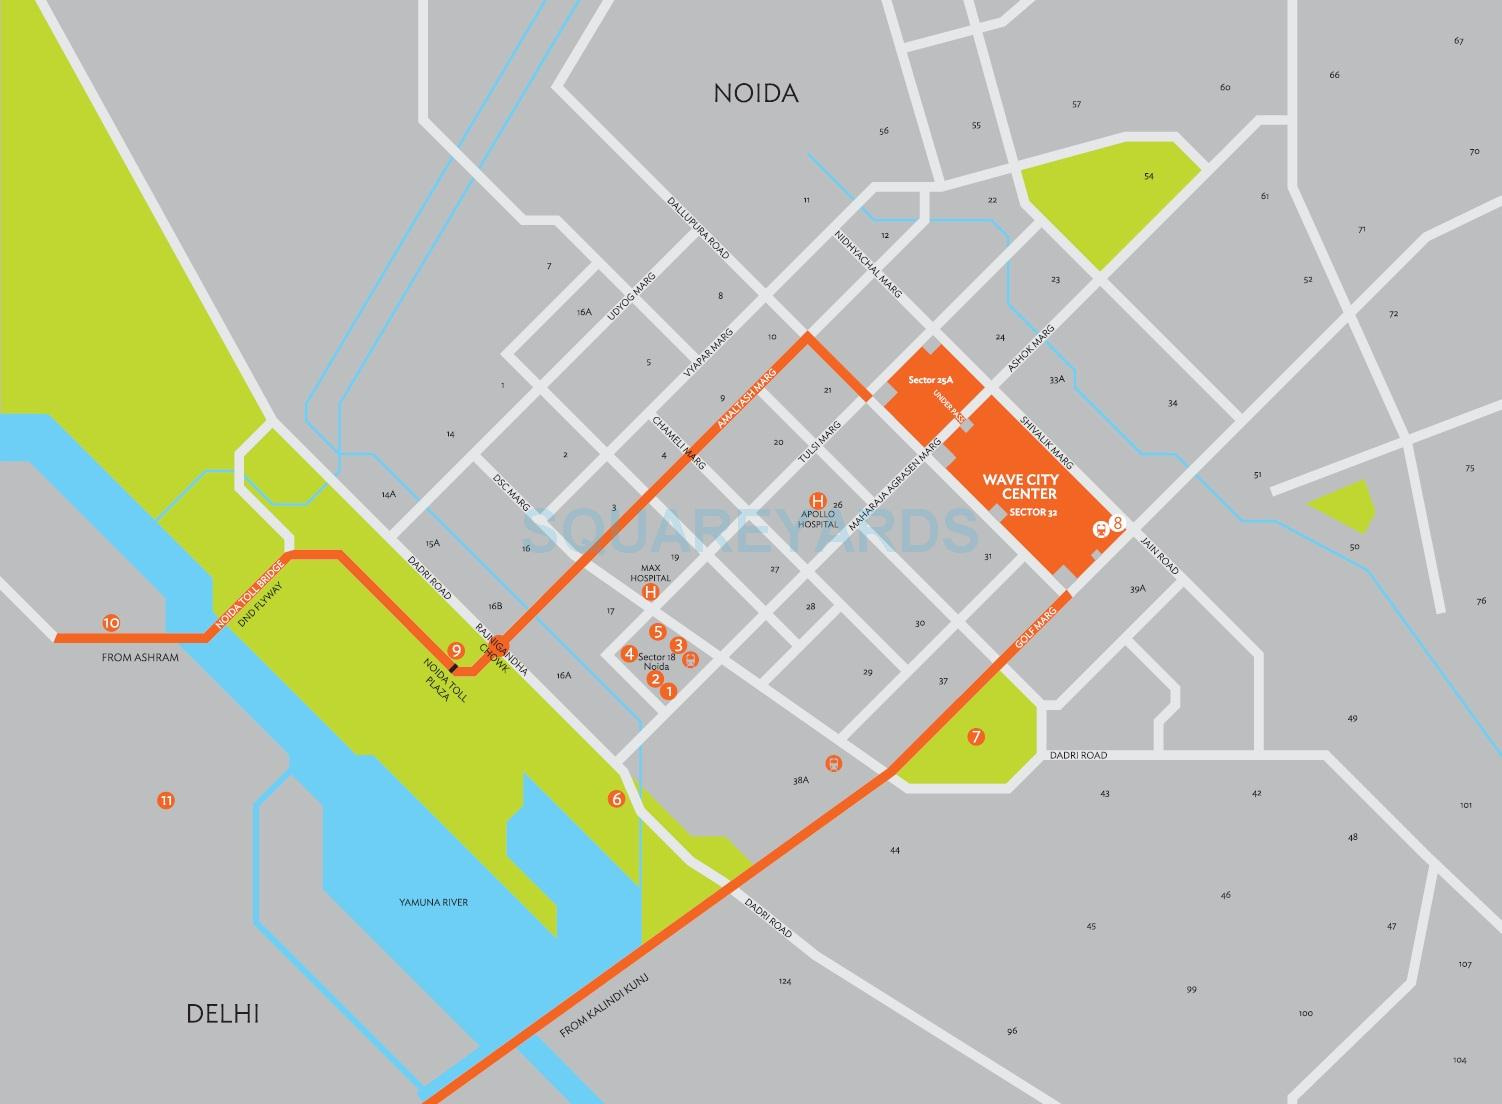 wave city center eminence location image1